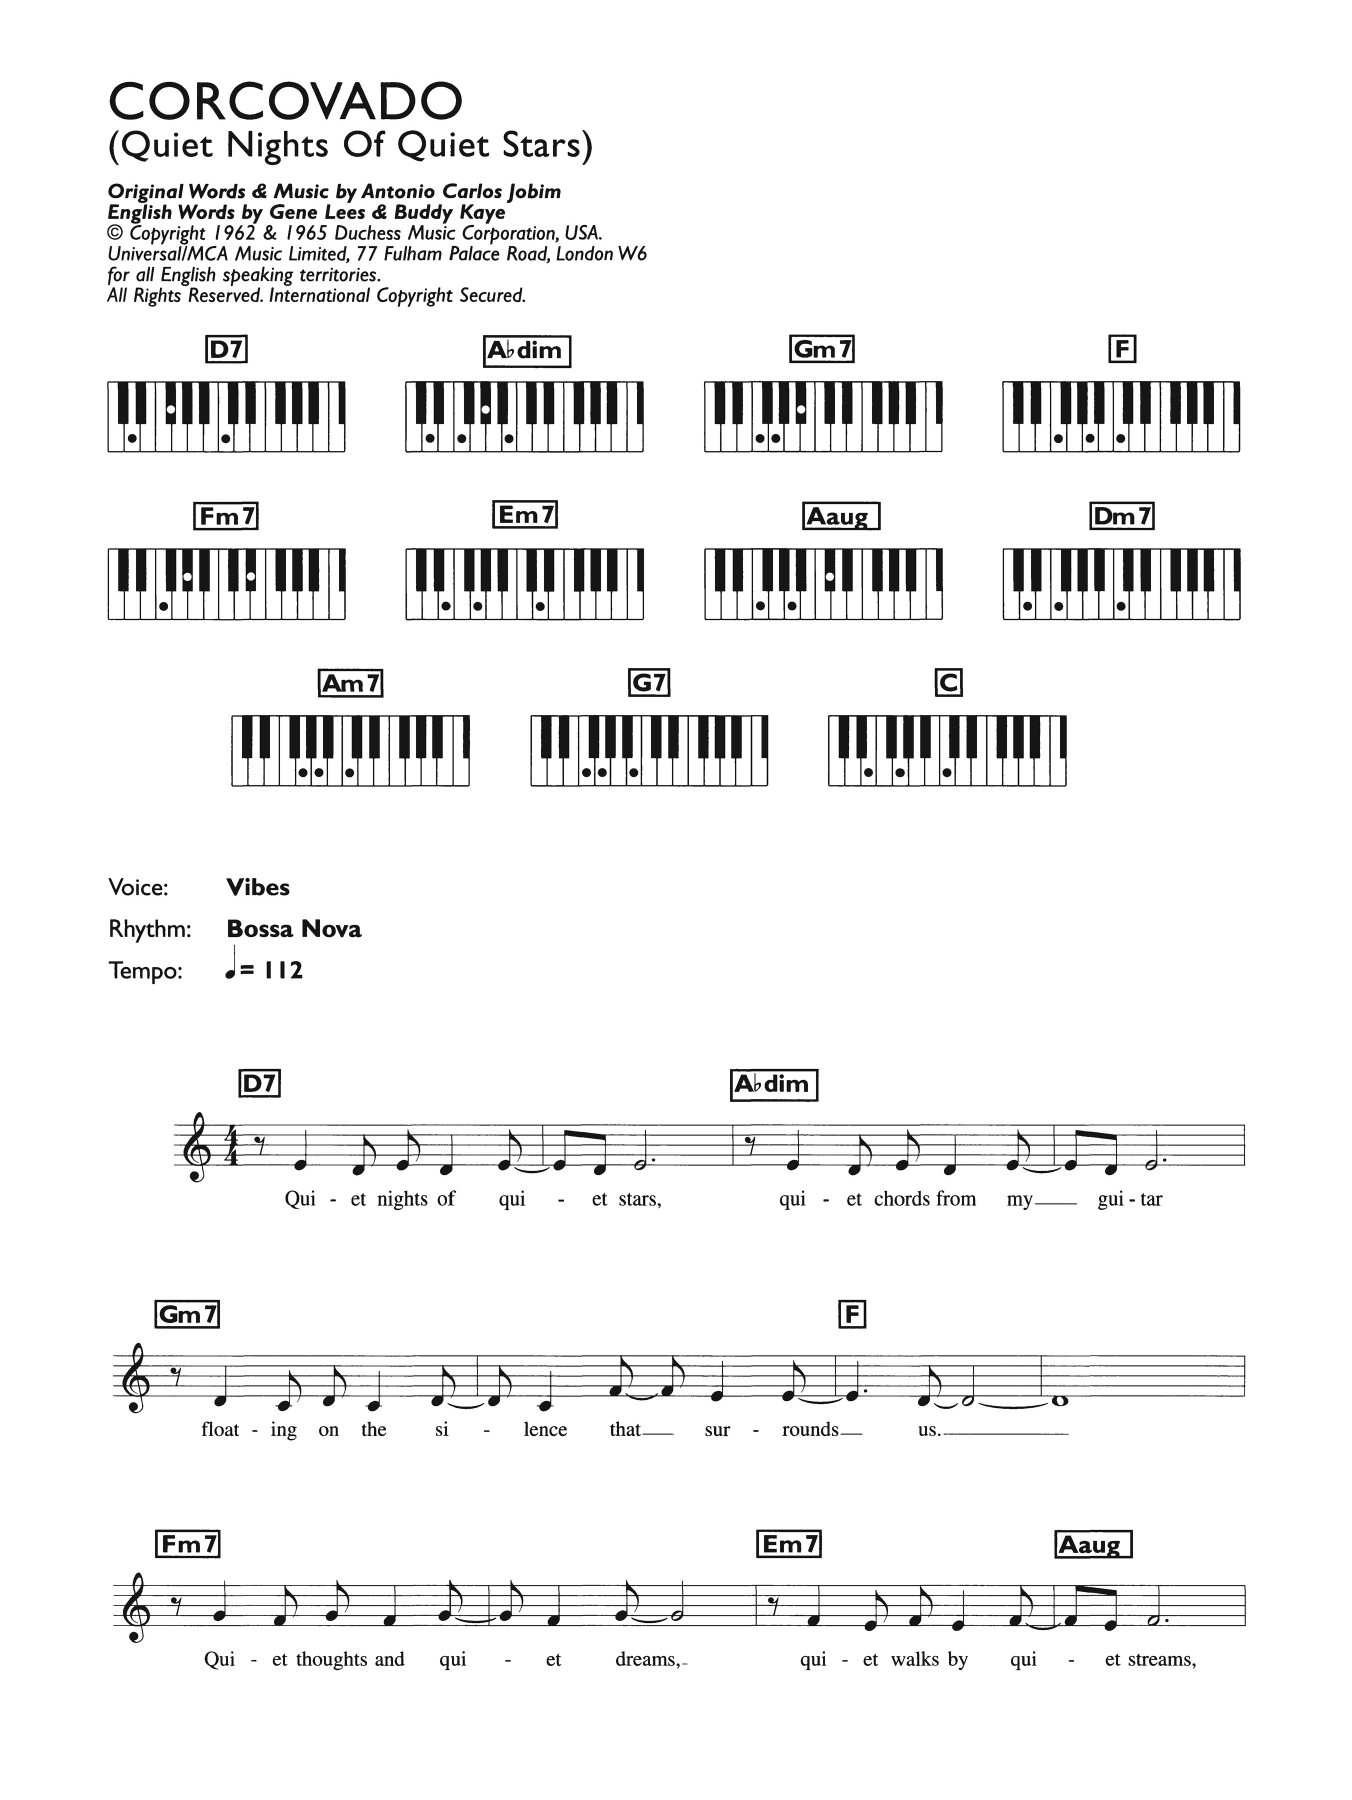 Corcovado (Quiet Nights Of Quiet Stars) Sheet Music